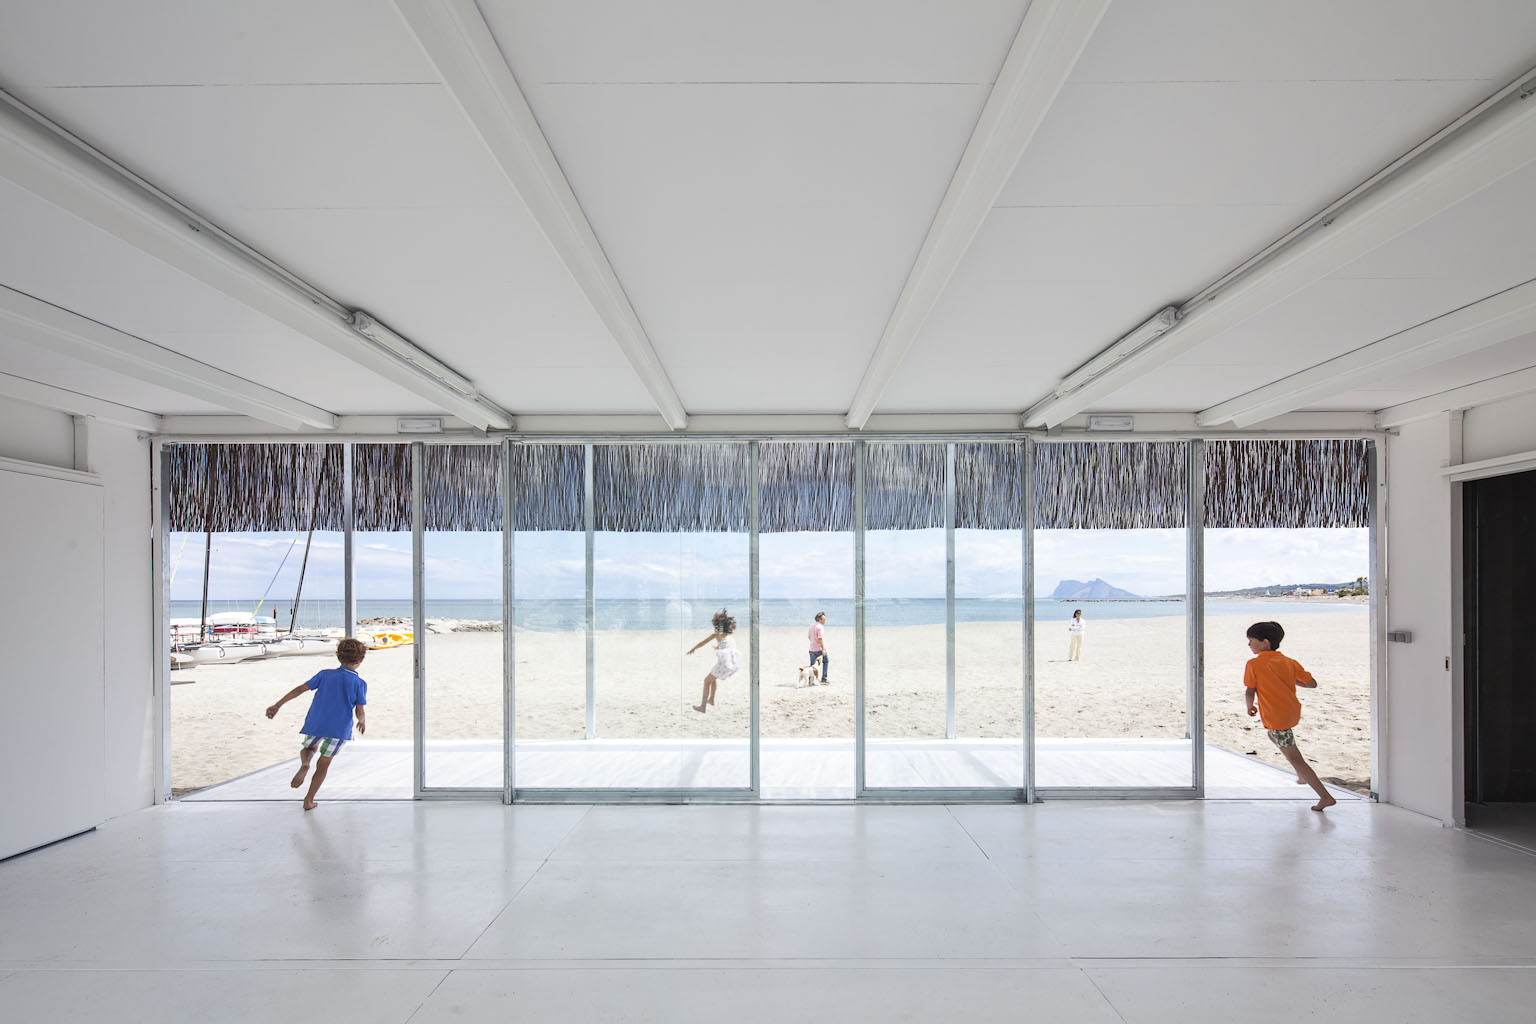 Fotografia e Arquitetura: Montse Zamorano, Escola de Vela de Sotogrande em Cádiz. Héctor Fernández Elorza/HFE Arch + Carlos García Fernández . Imagem © Montse Zamorano